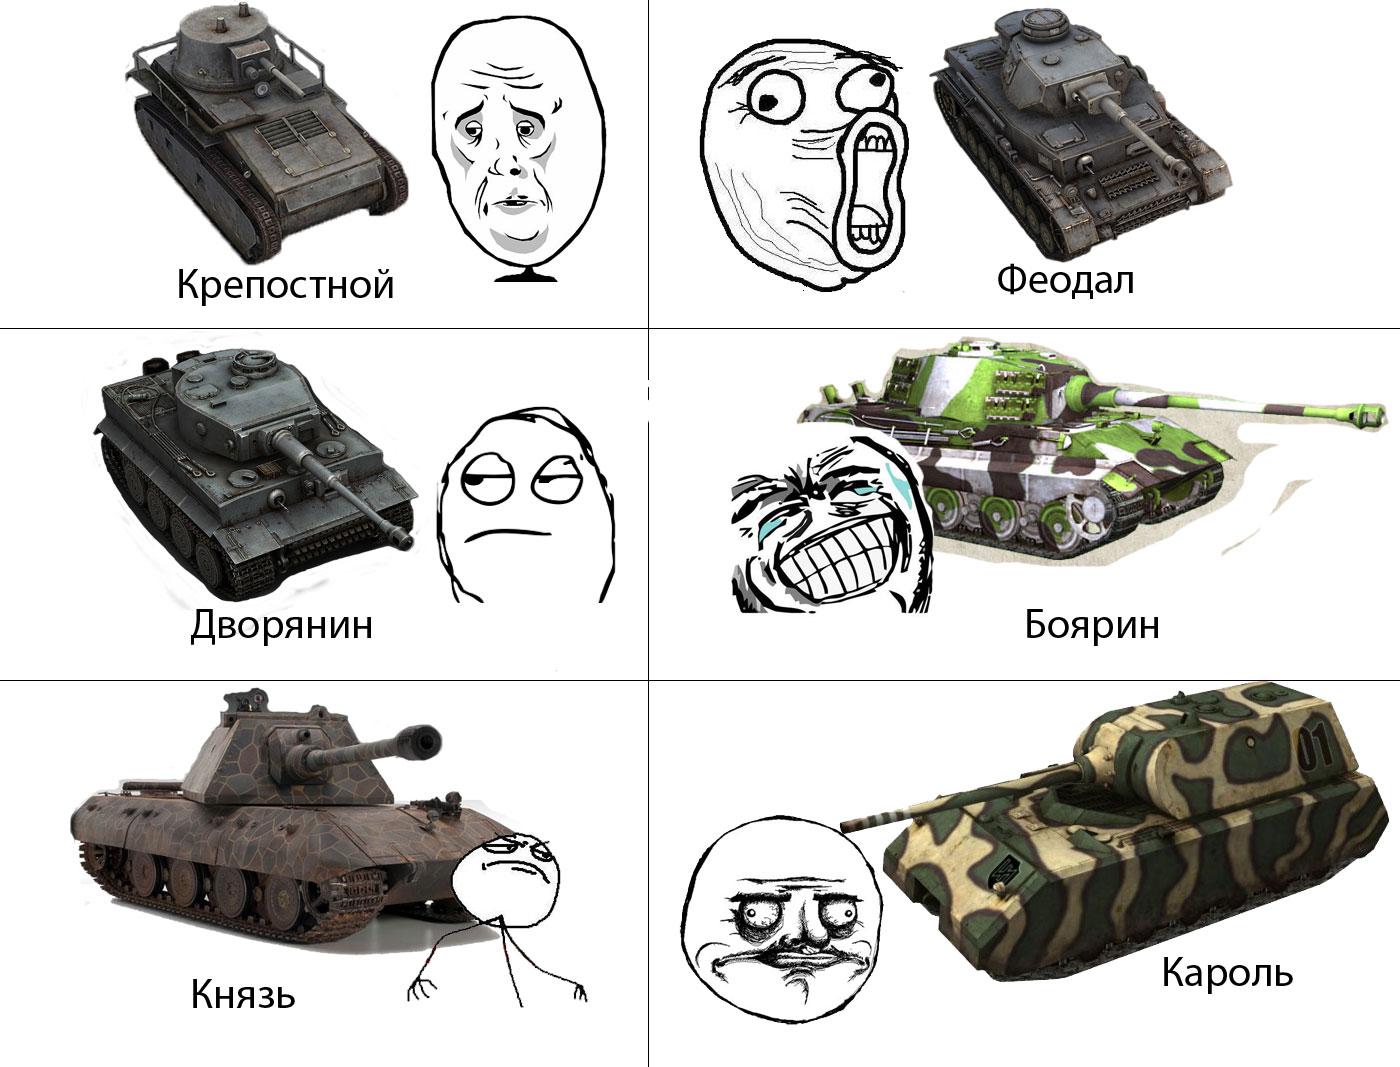 Ворлд оф танкс мемы